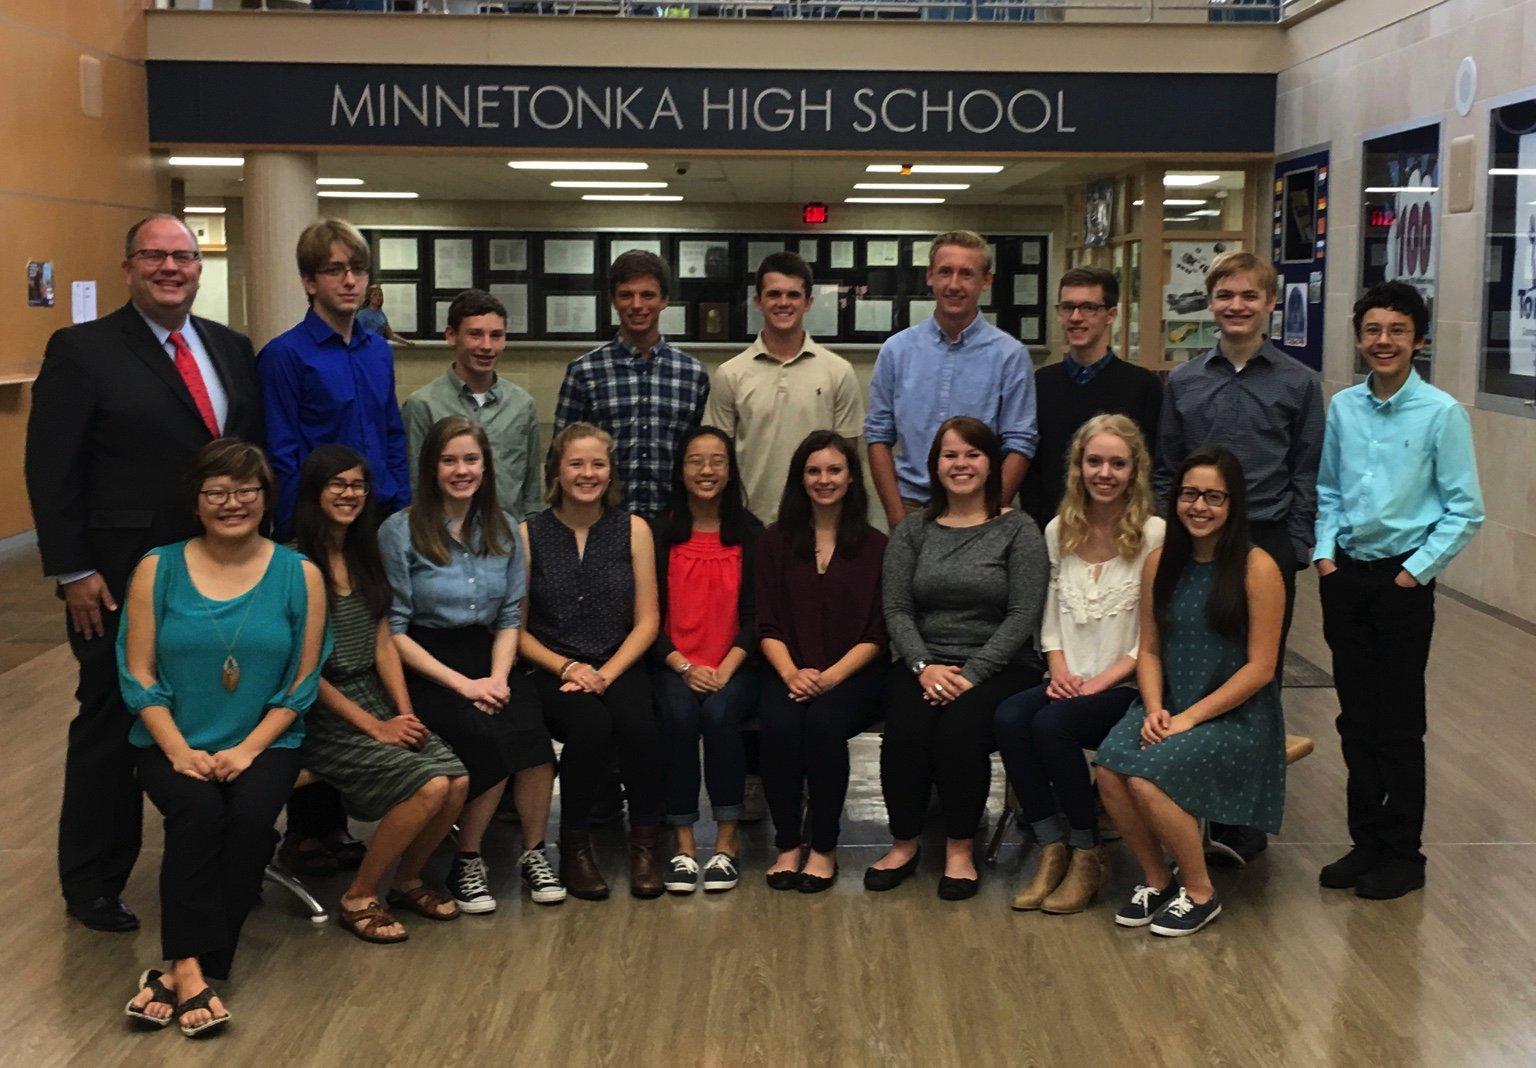 Jeff Erickson poses with National Merit Scholars.